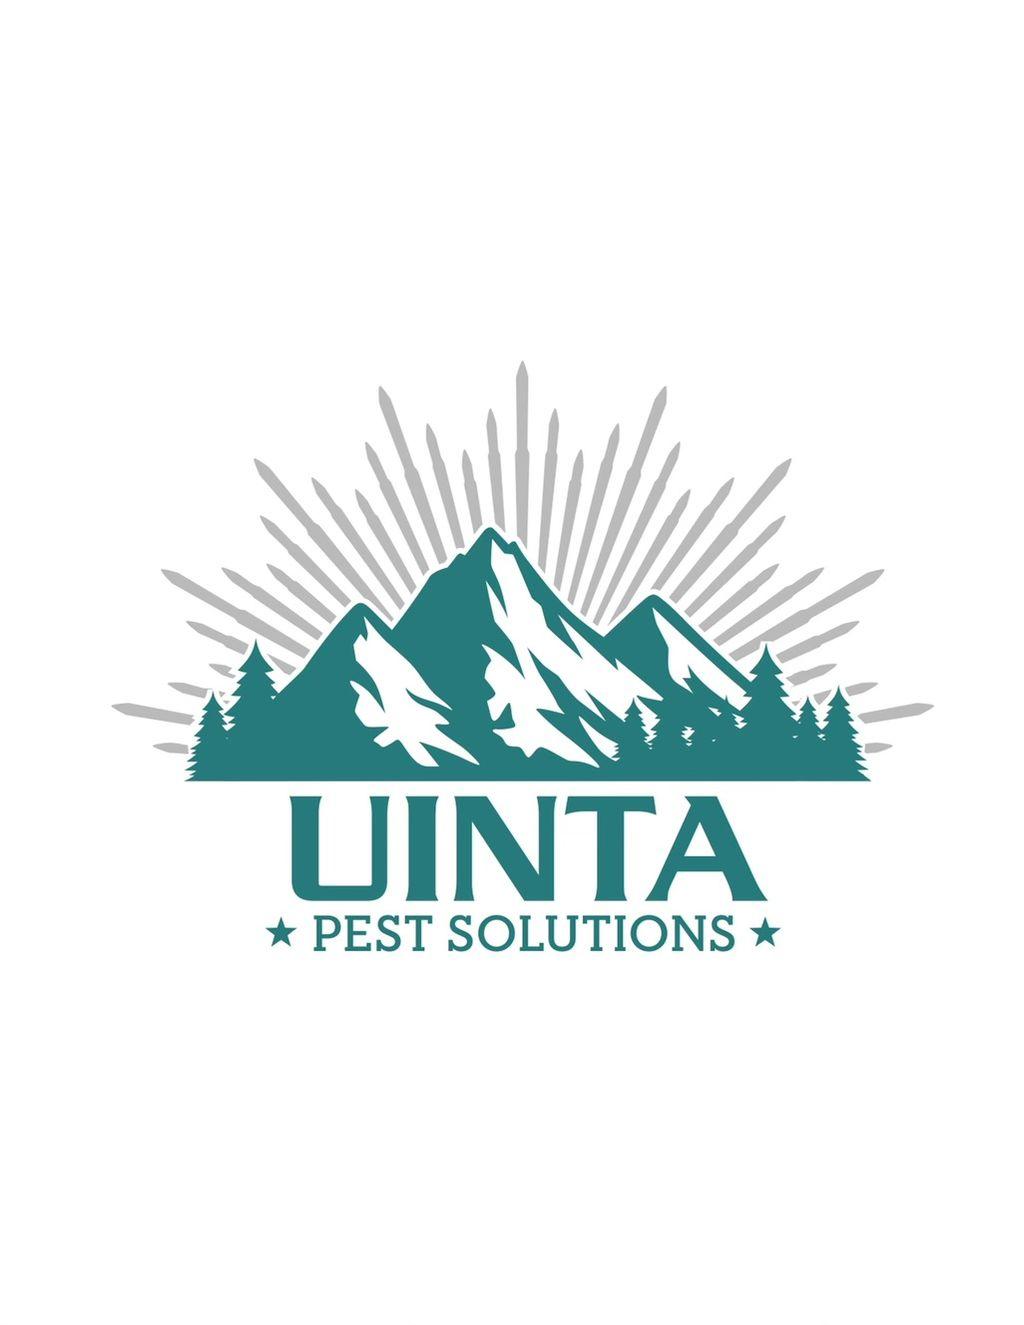 Uinta pest solutions